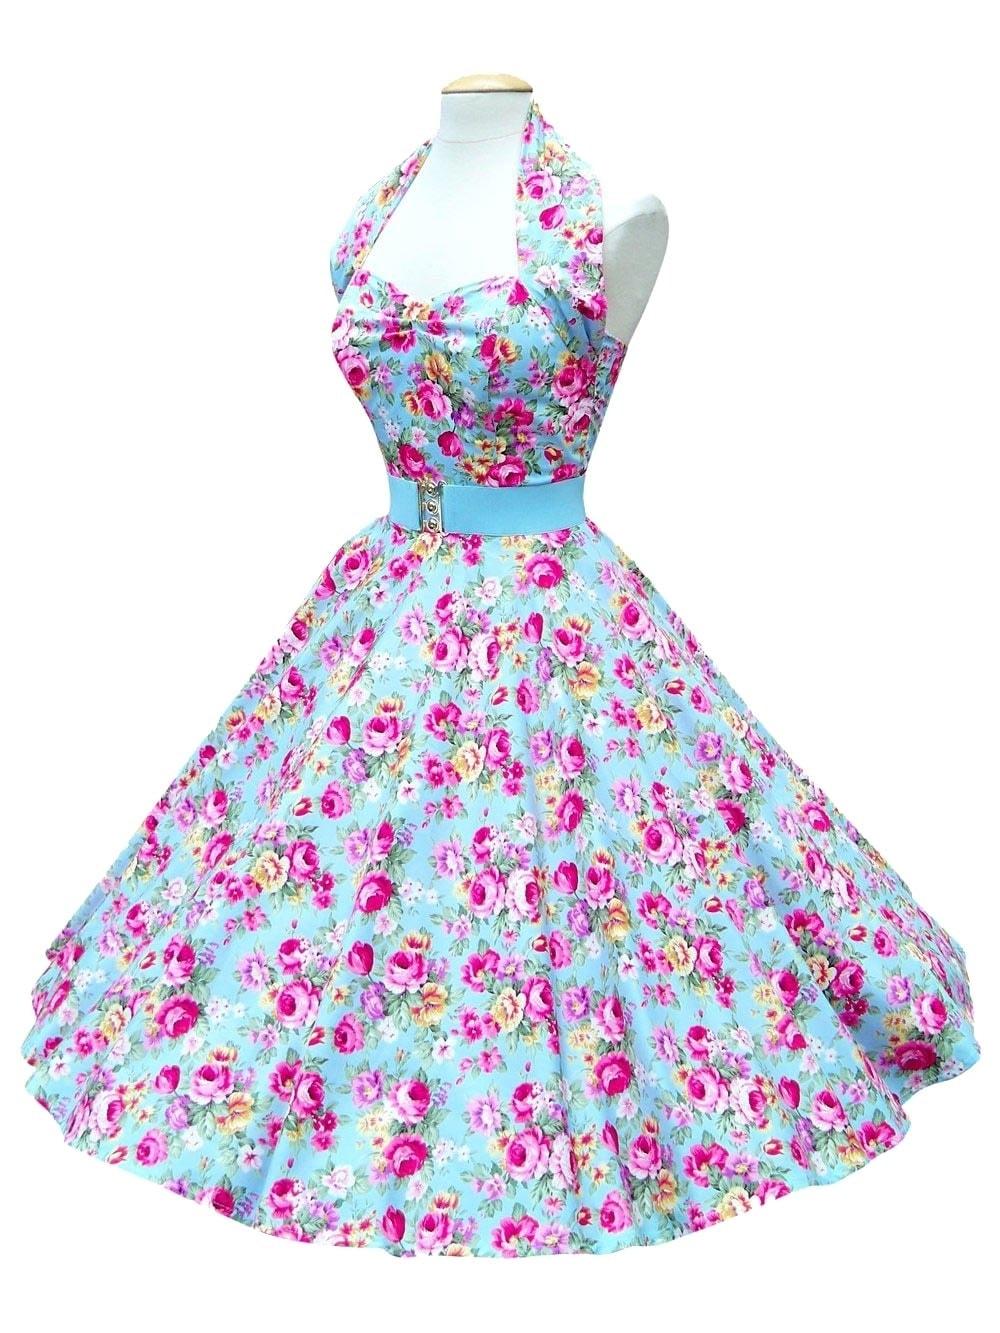 4d97e675 1950s Halterneck Floral Dresses from Vivien of Holloway